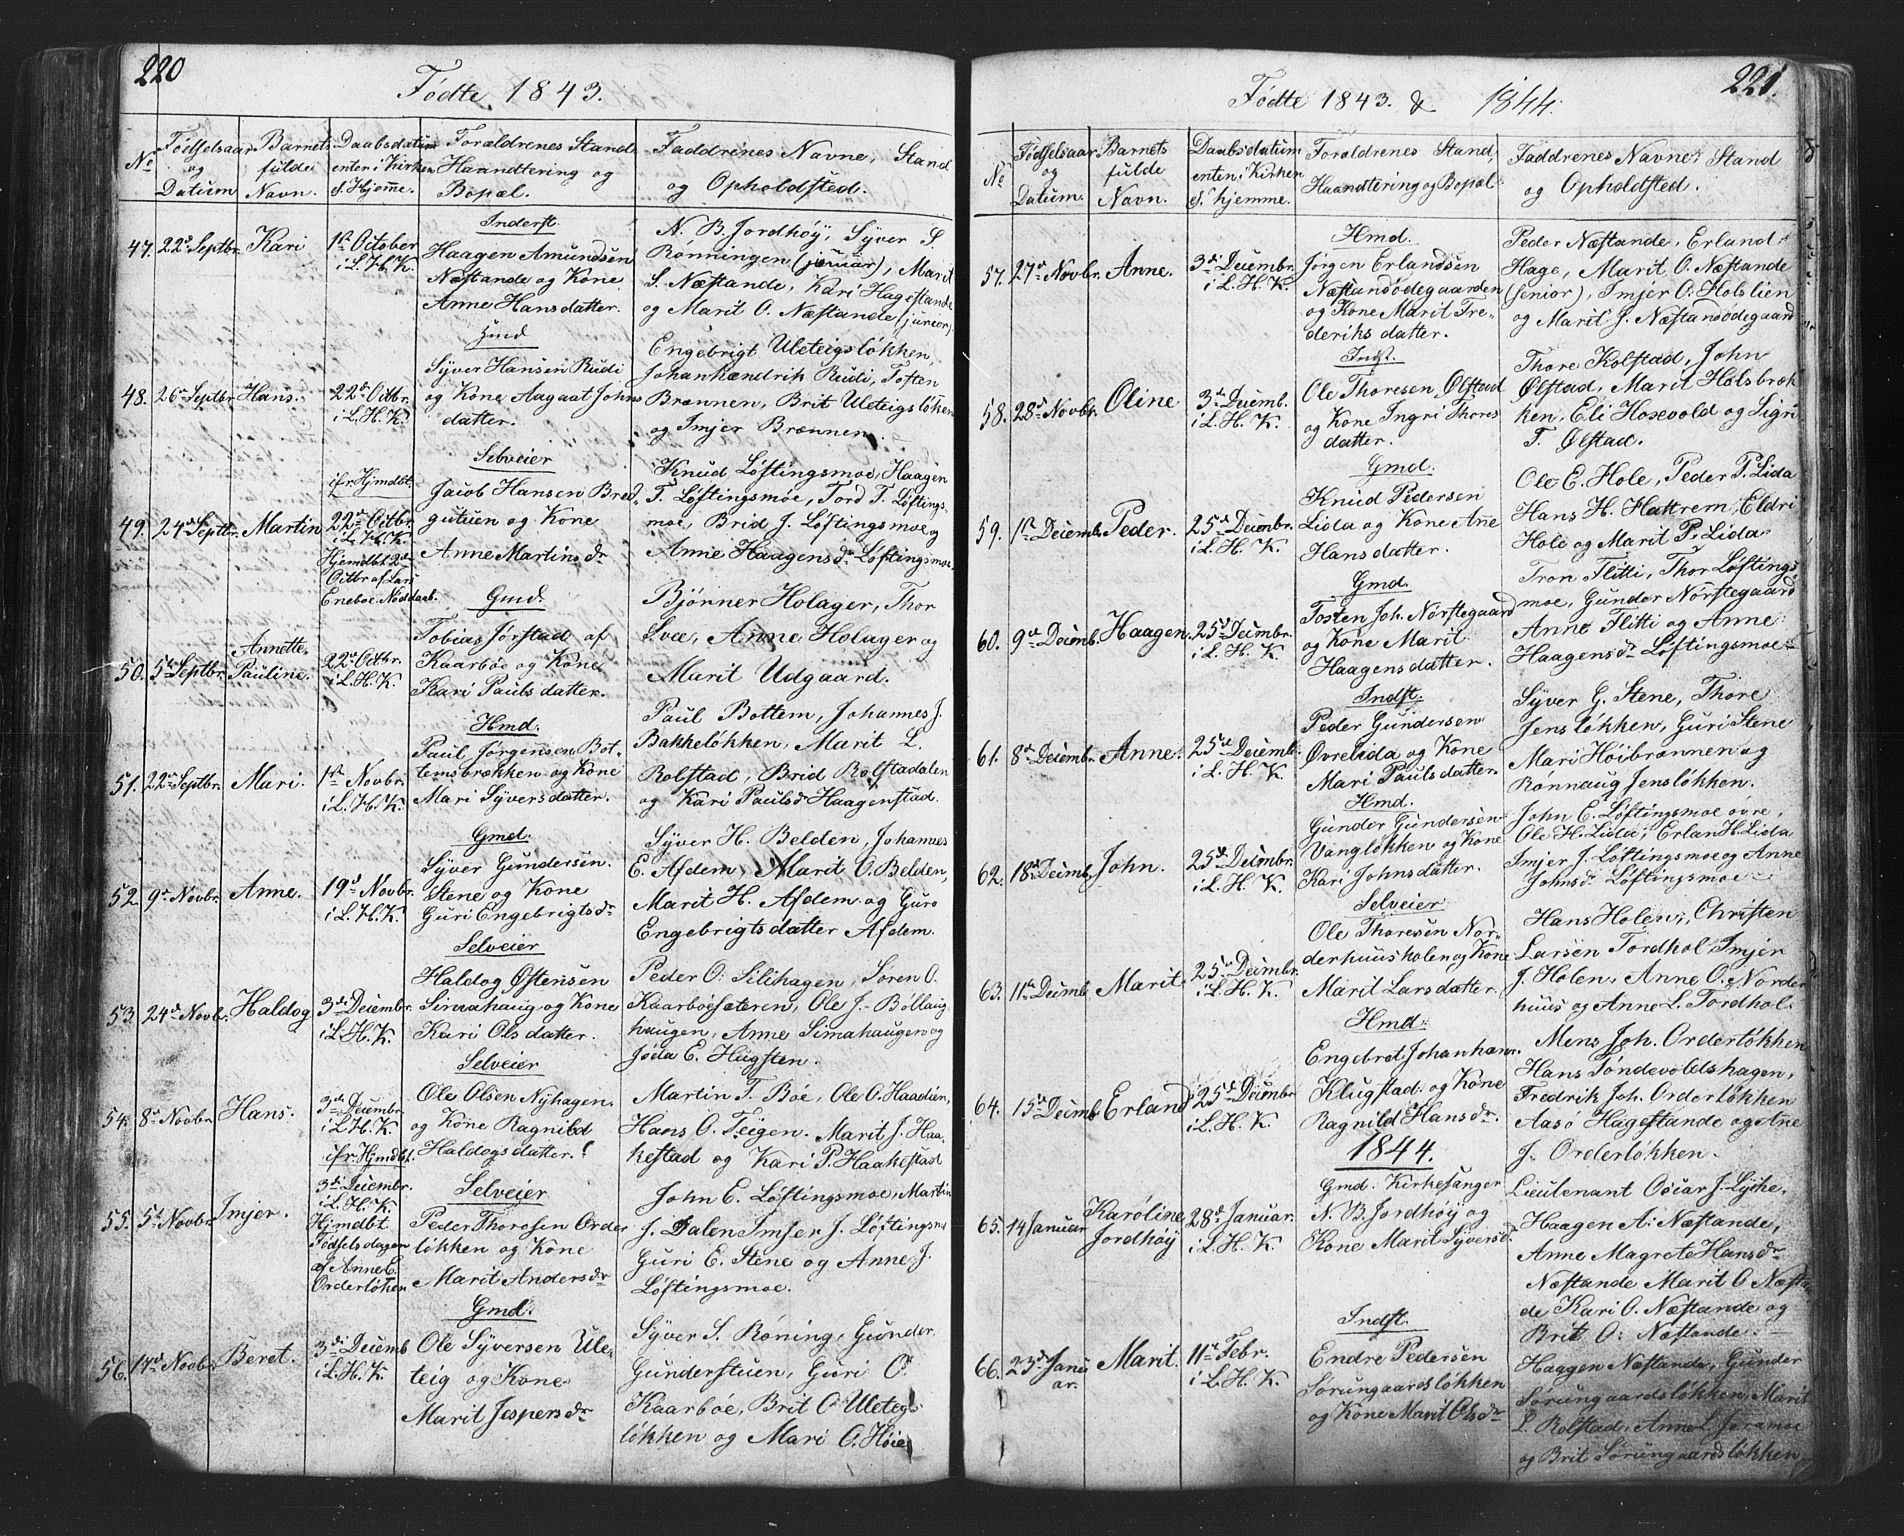 SAH, Lesja prestekontor, Klokkerbok nr. 2, 1832-1850, s. 220-221